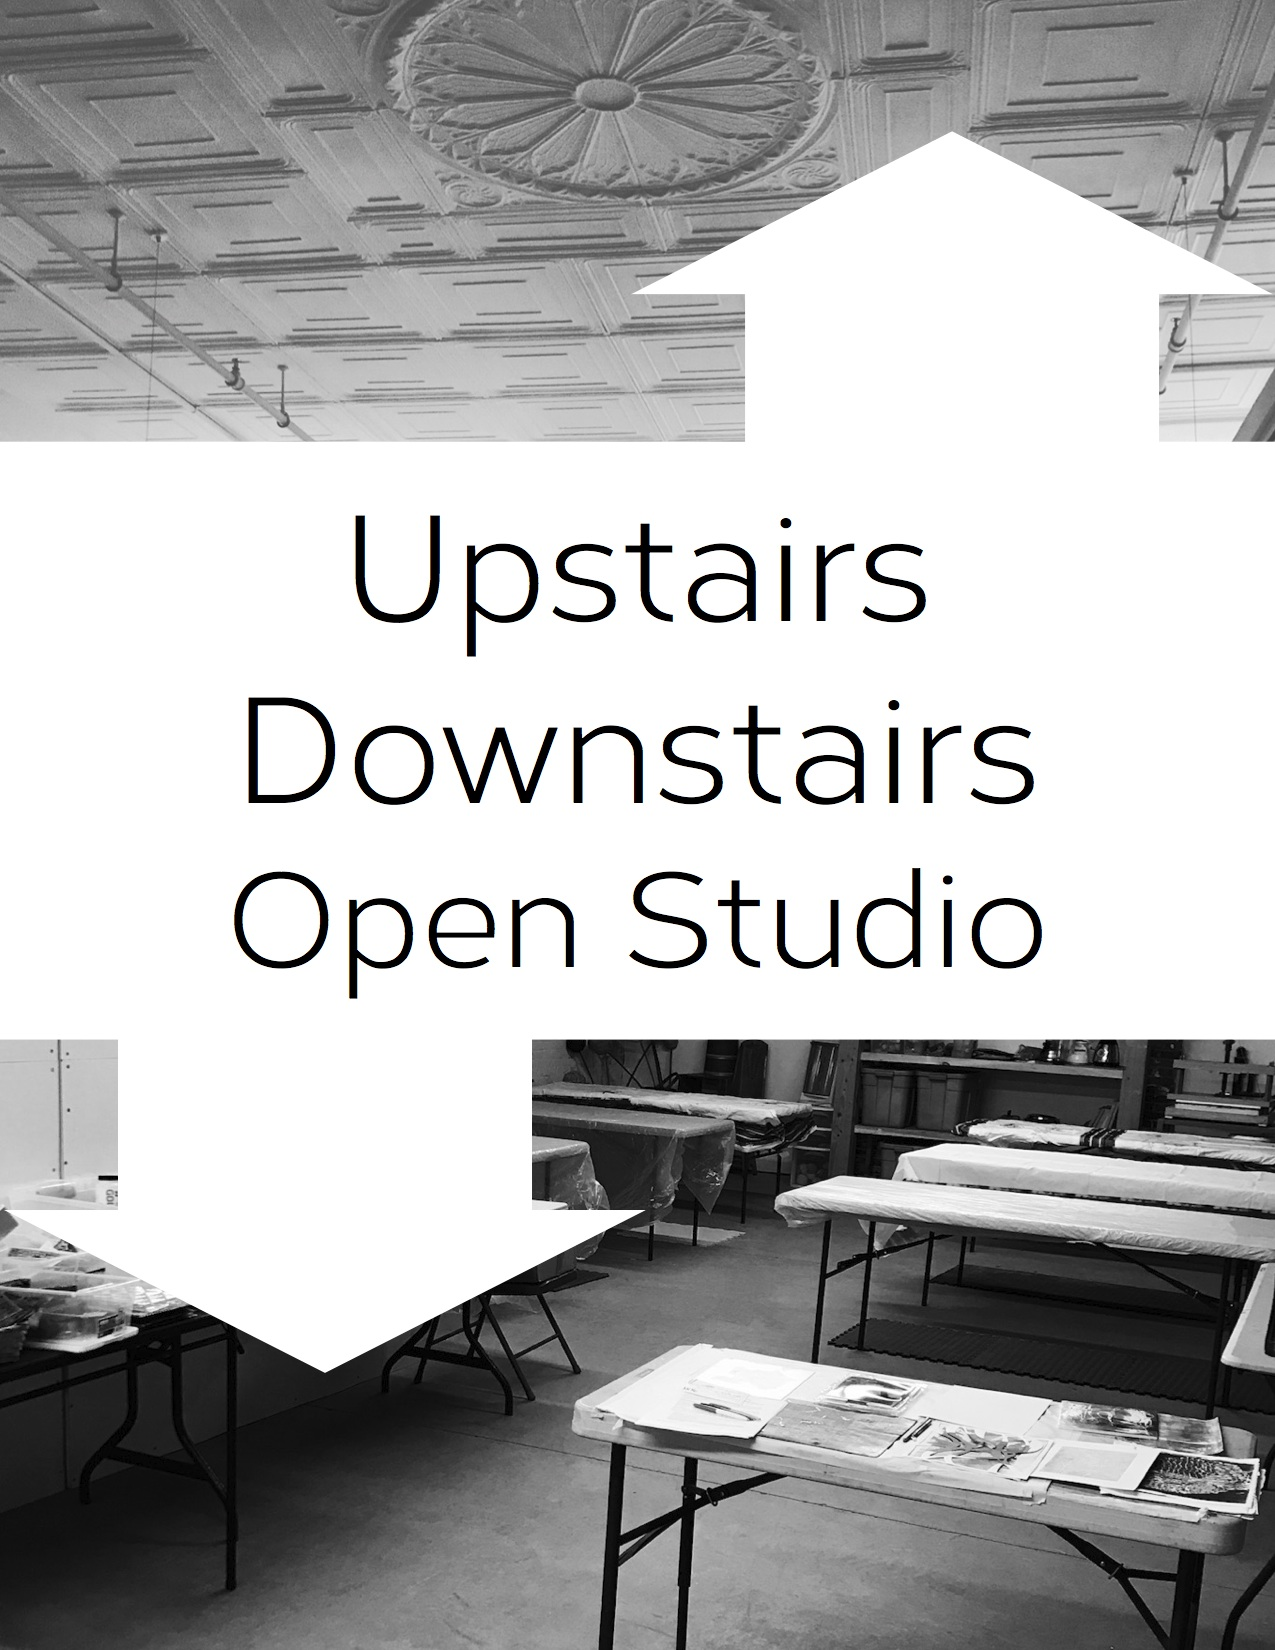 upstairs Downstairs.jpg